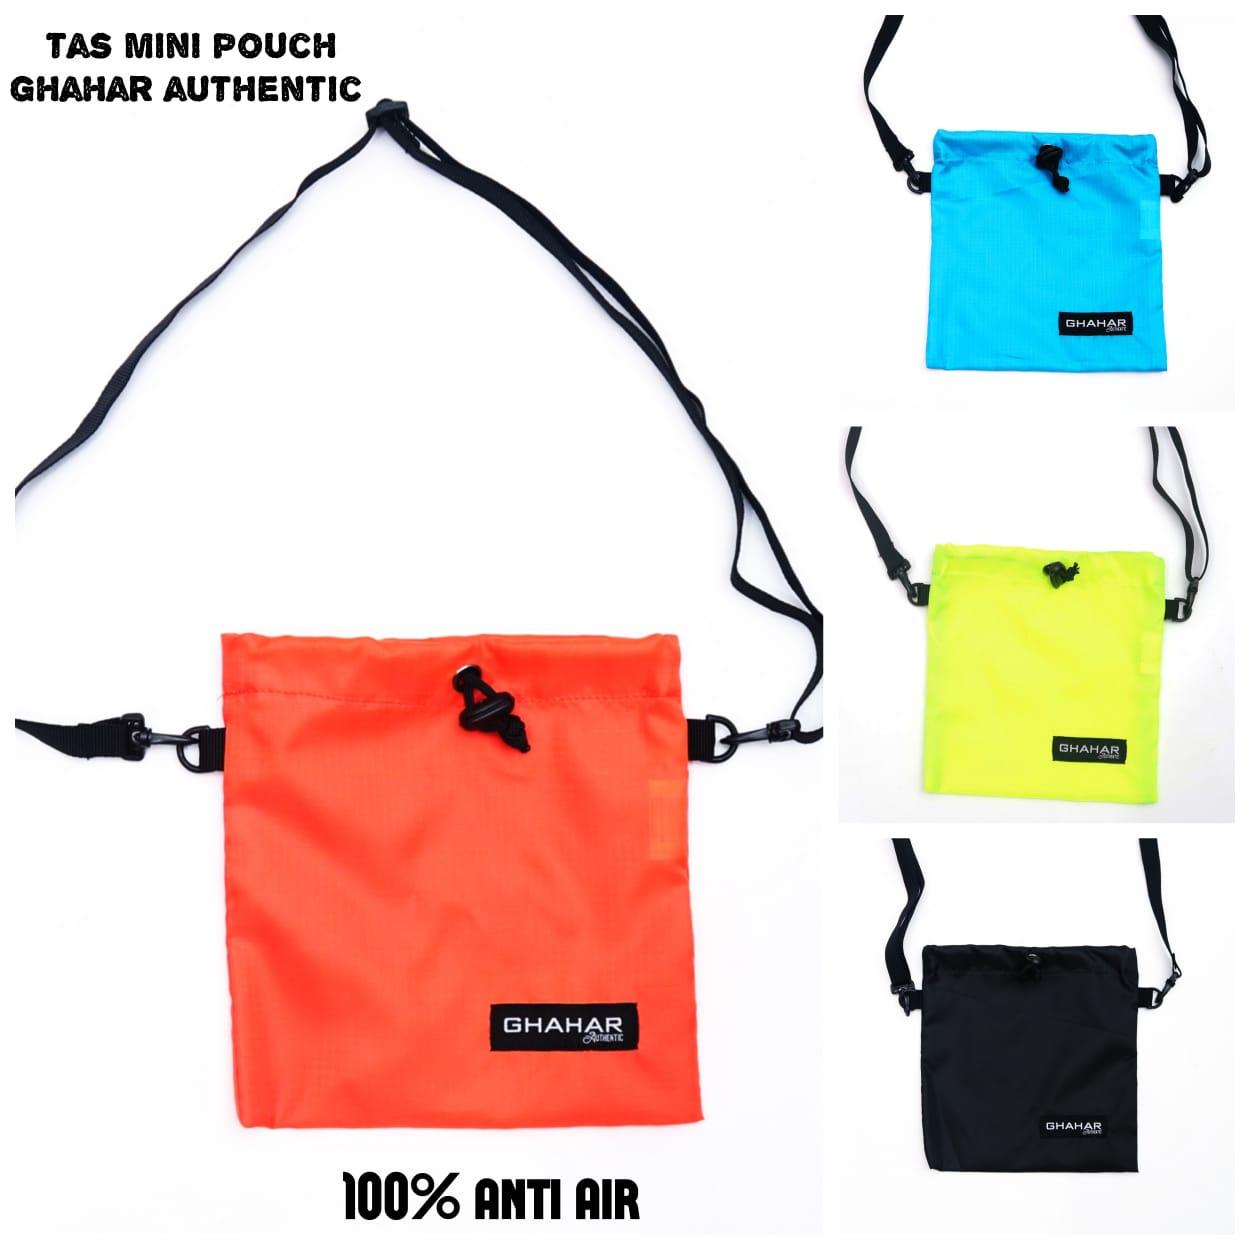 tas selempang mini / tas goes /tas pouch /tas new normal